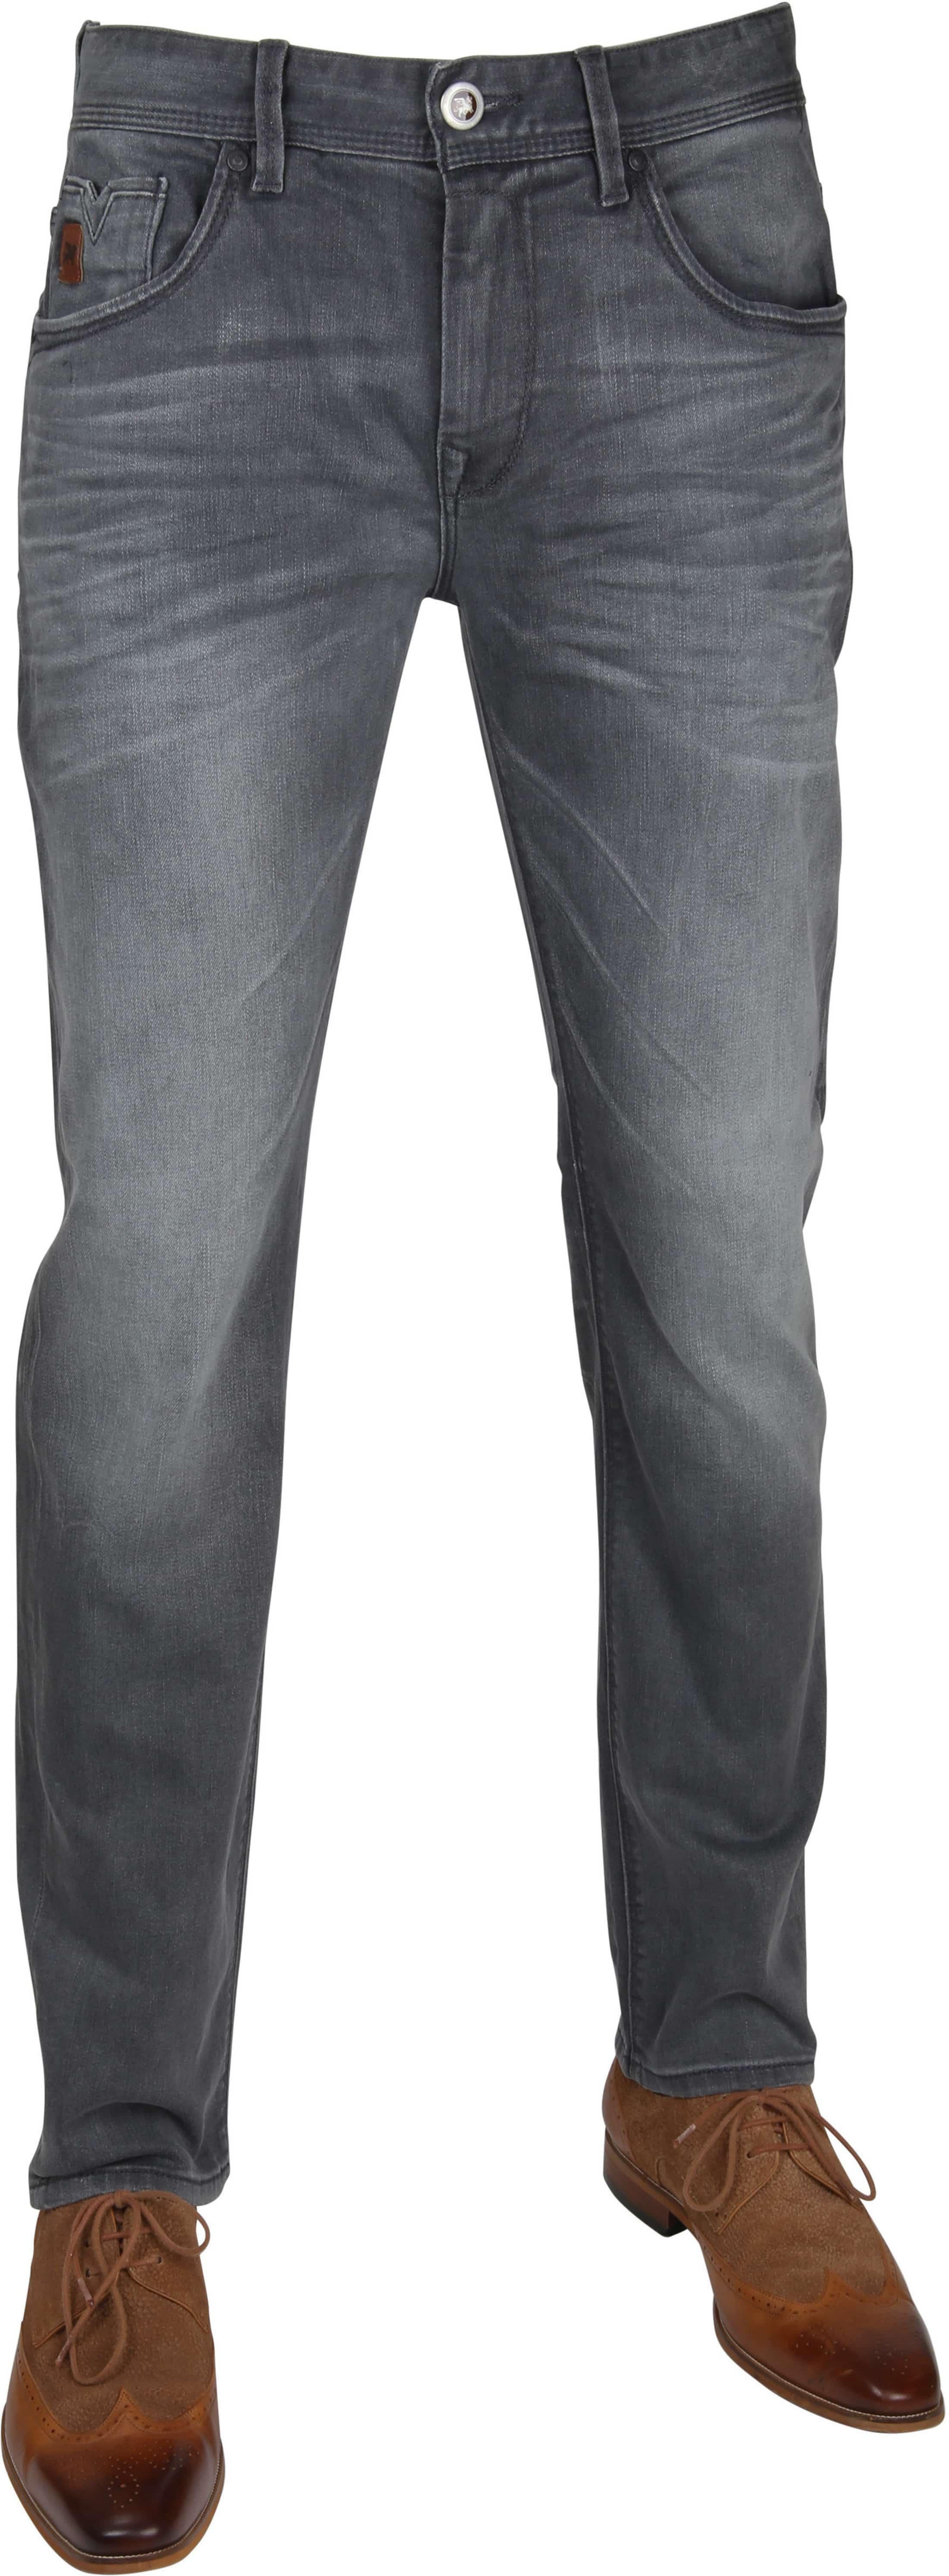 Vanguard V7 Rider Jeans Antraciet foto 0